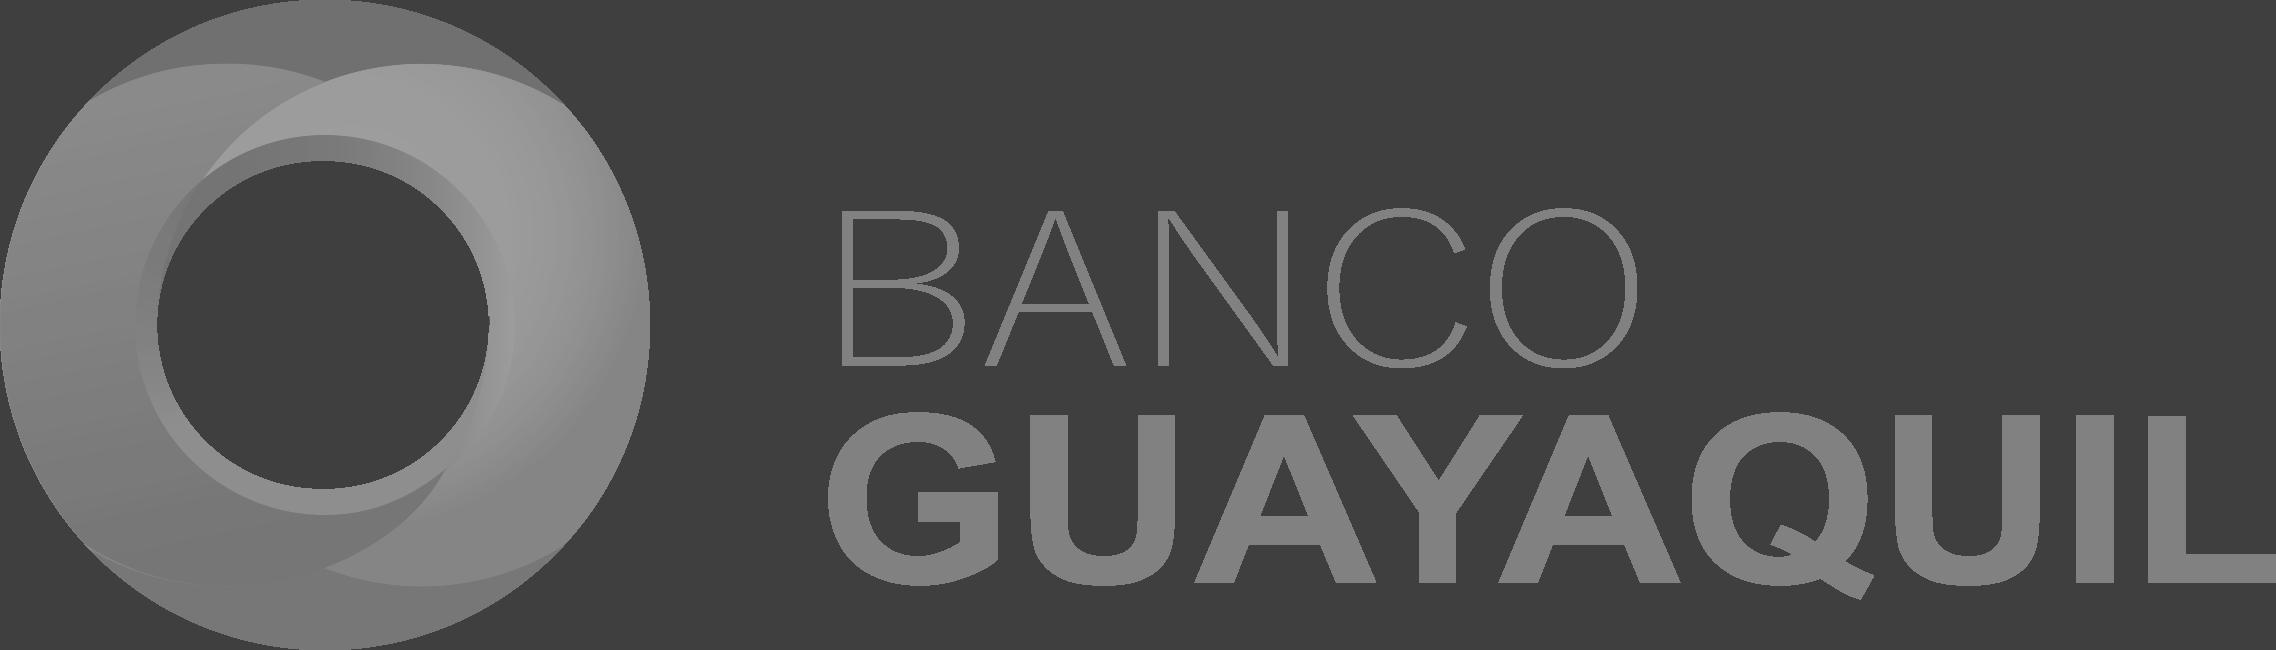 banco guayaq